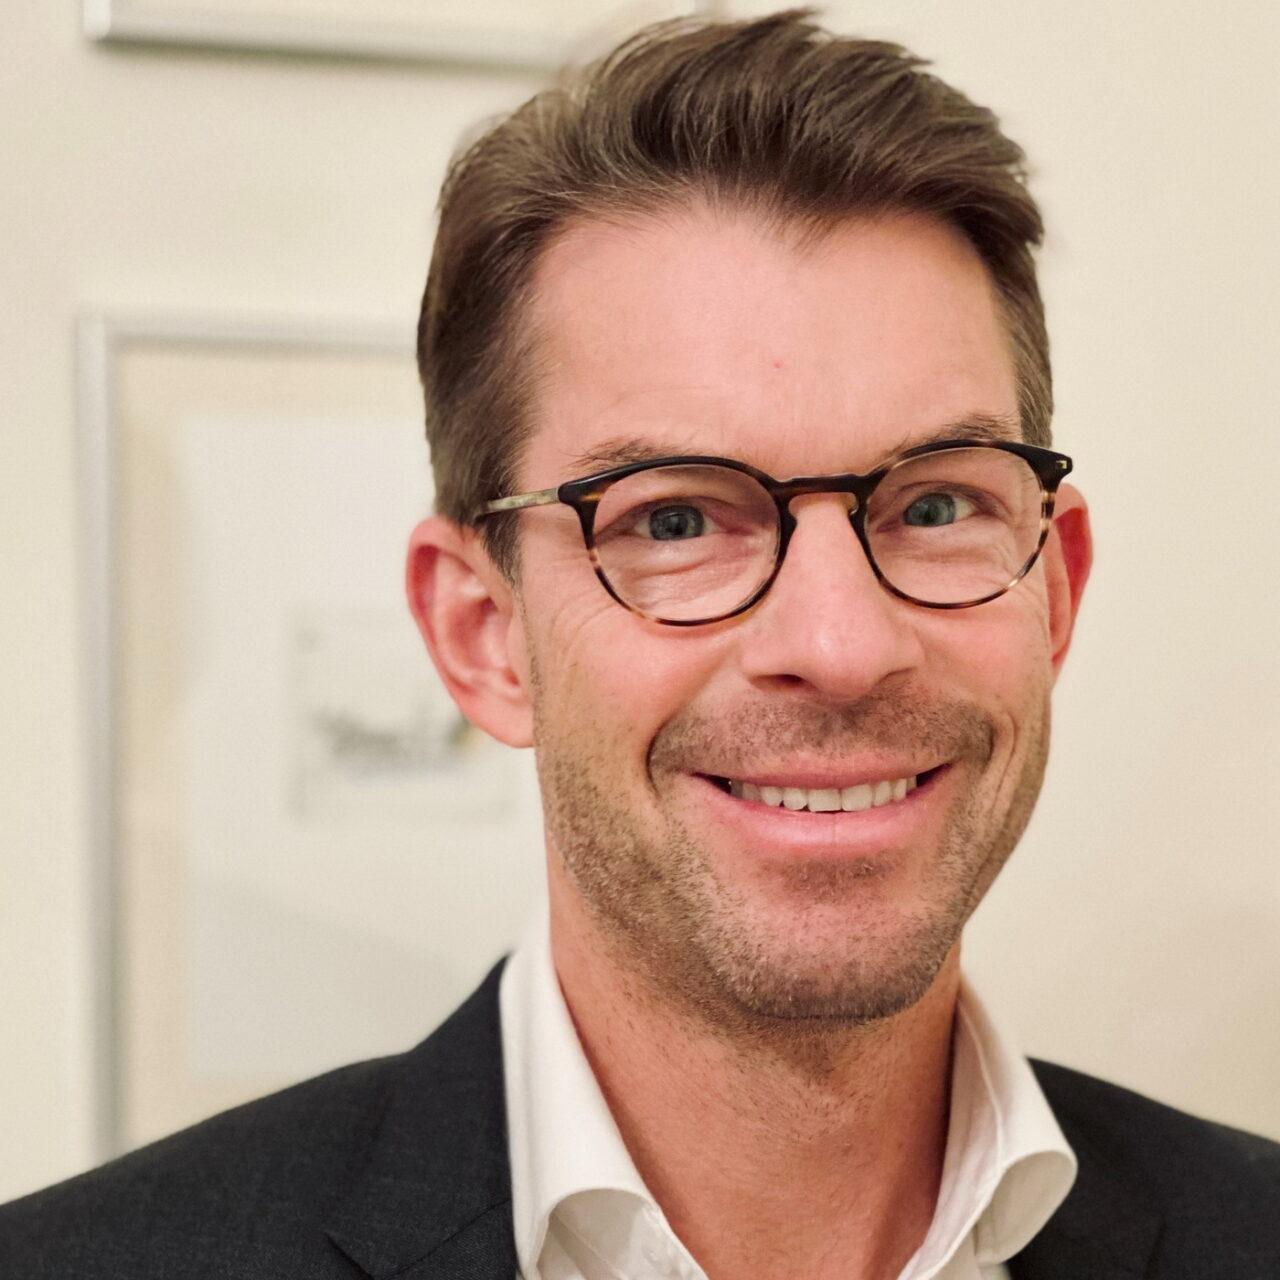 Dr. Muschter zieht in Vorstand der Zech Groupein